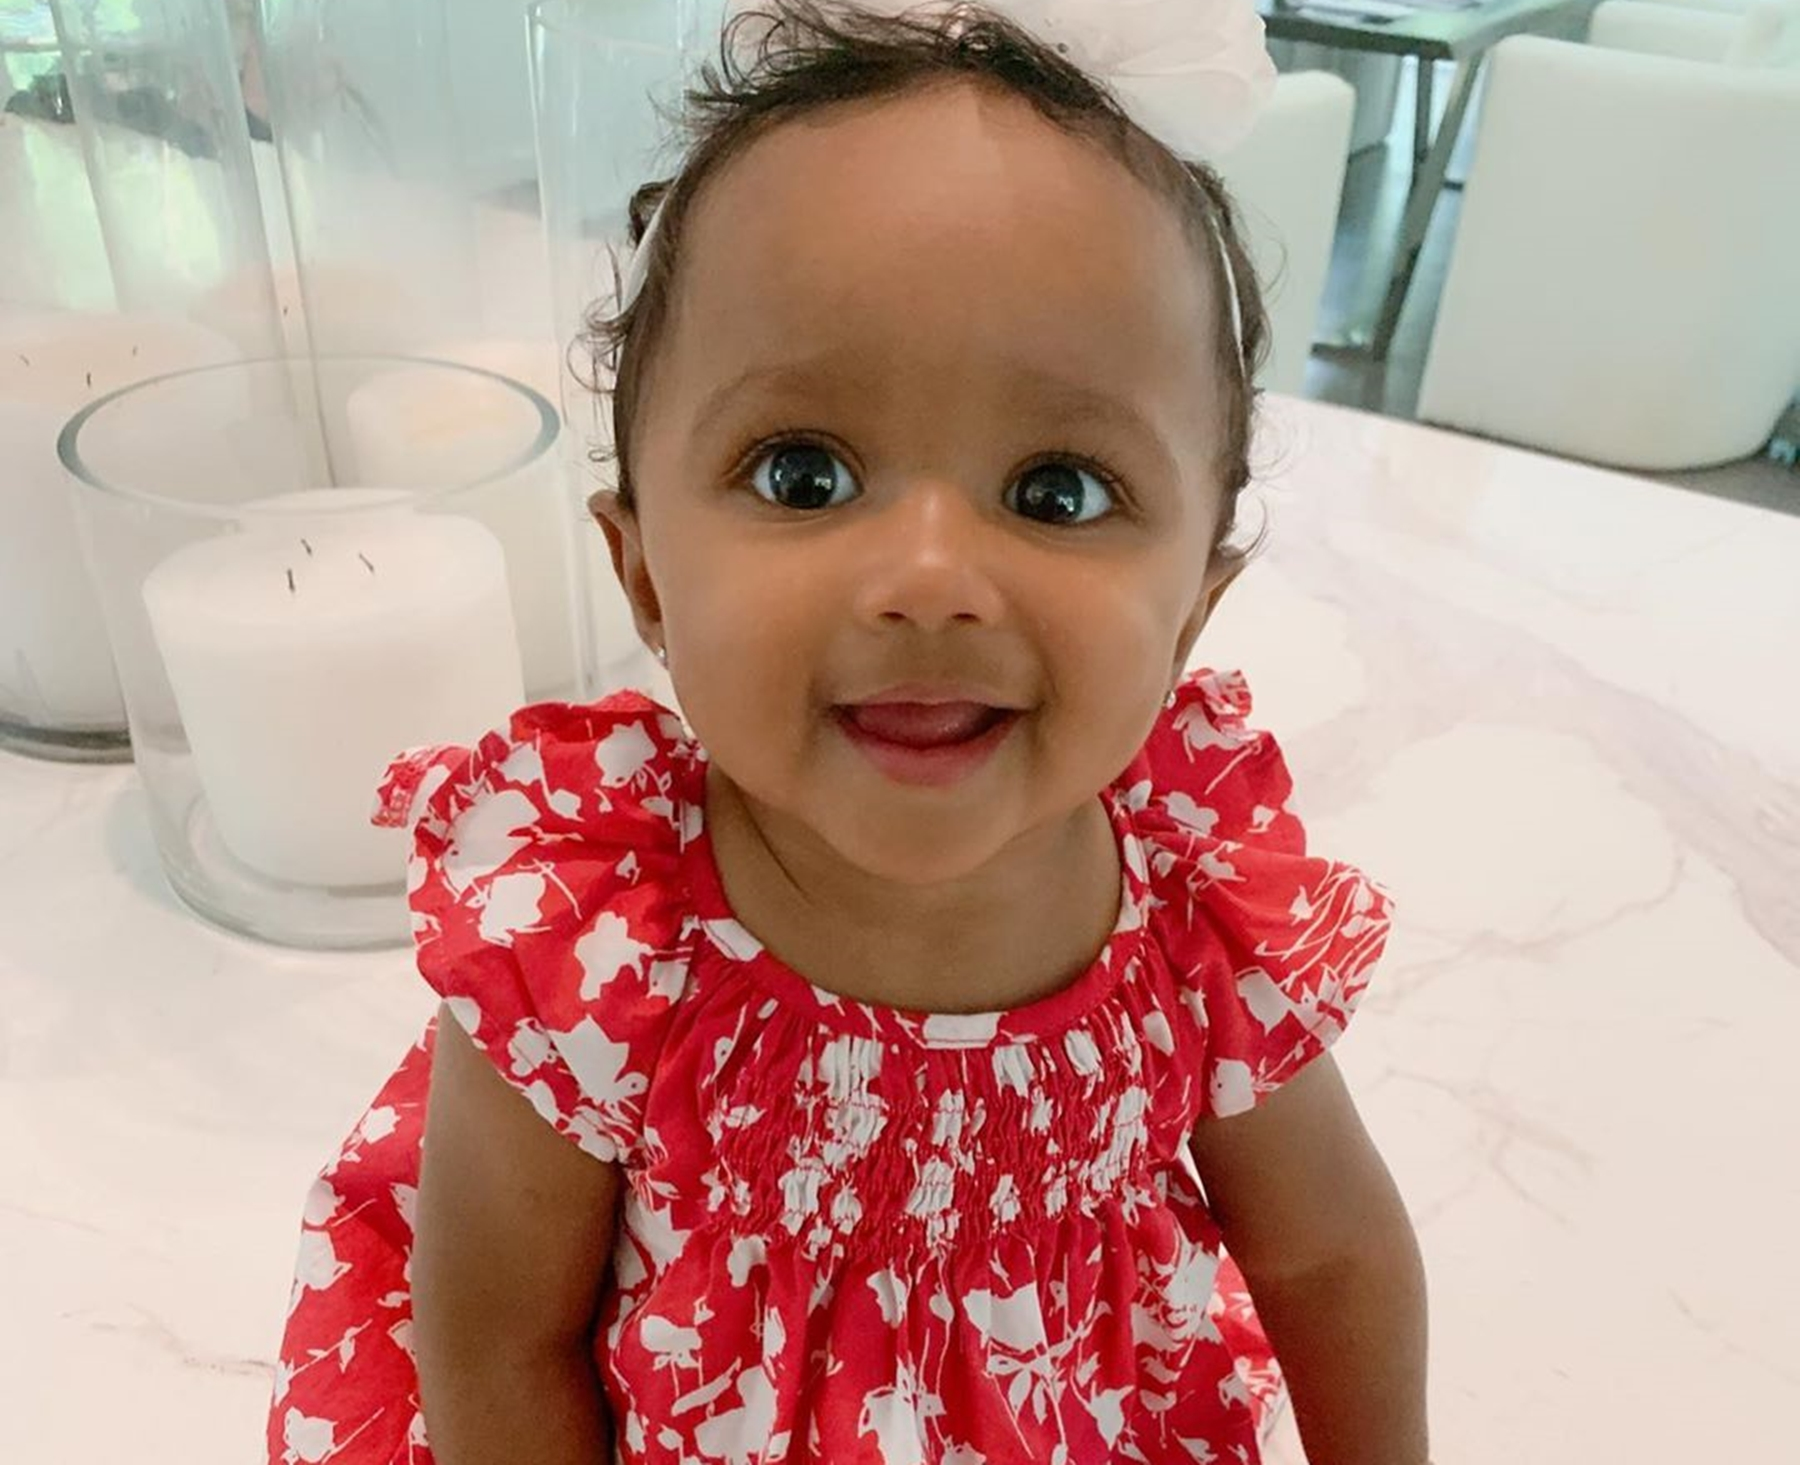 Kenya Moore's Baby Girl, Brooklun Daly Has Two Teeth Coming In - See The Cute Photo